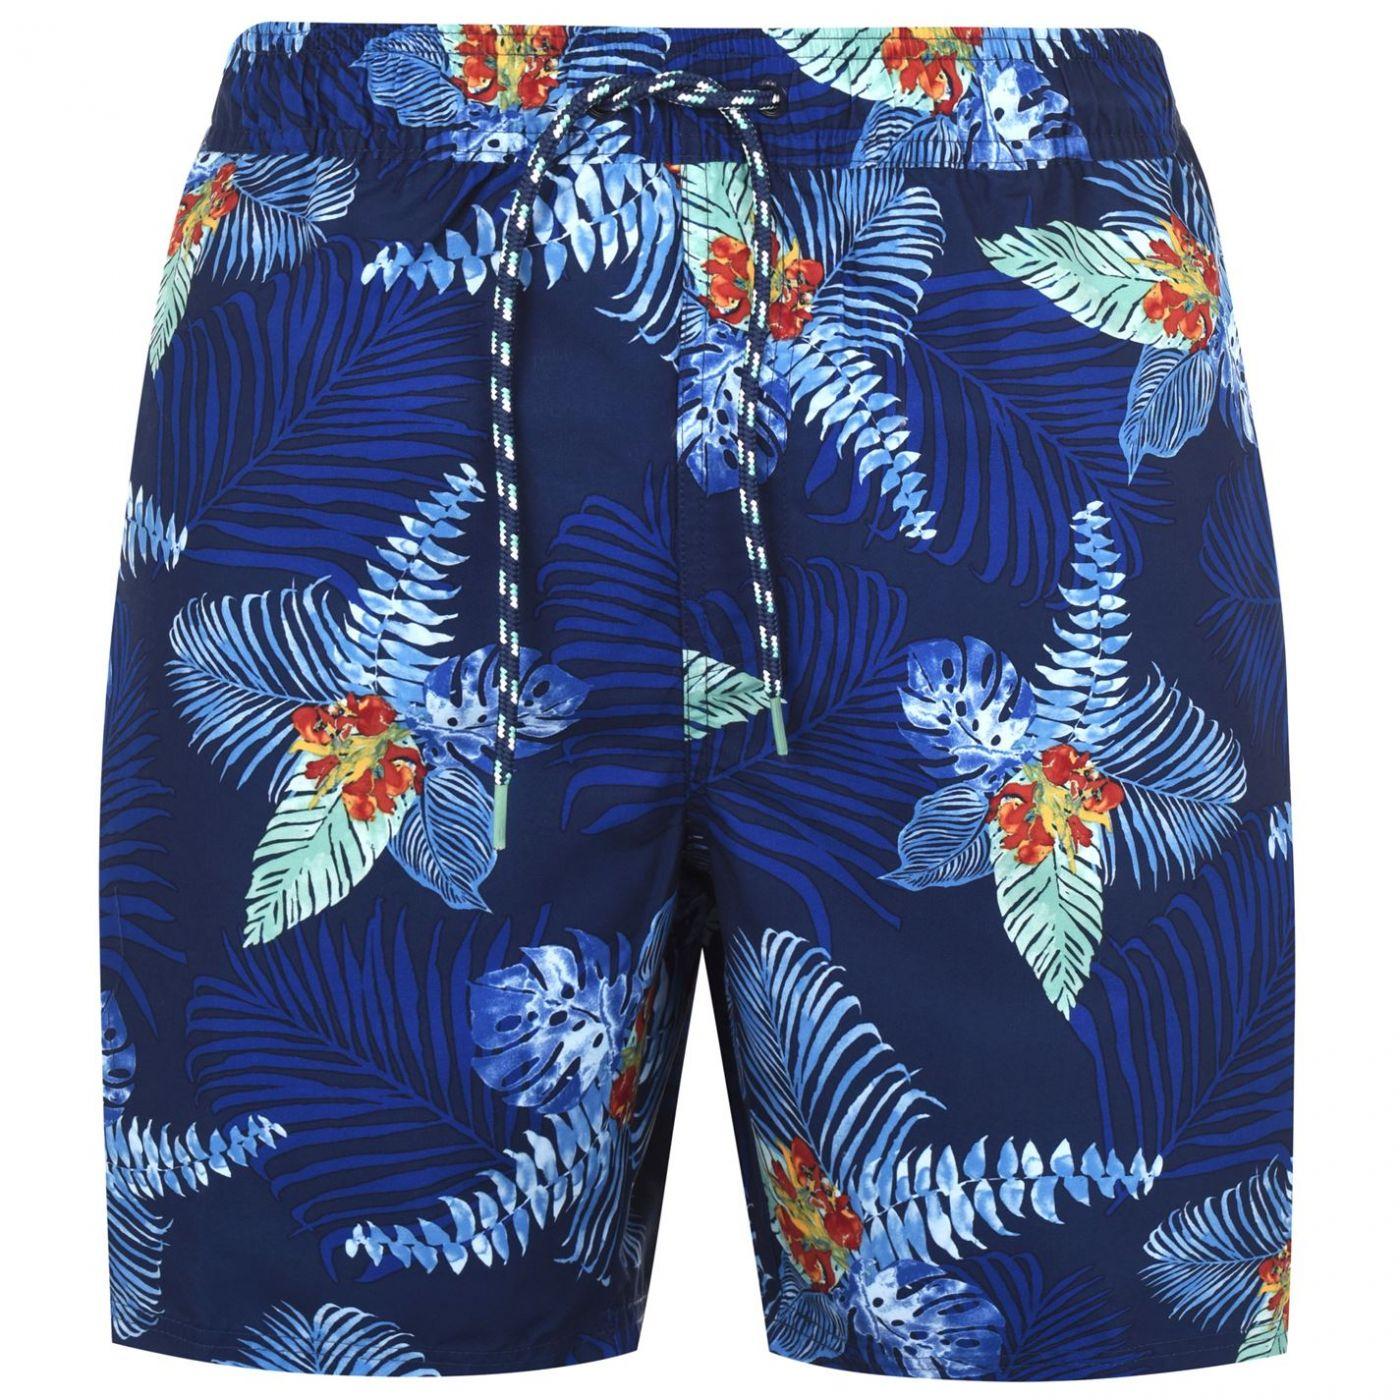 IZOD Palm Leaf Shorts